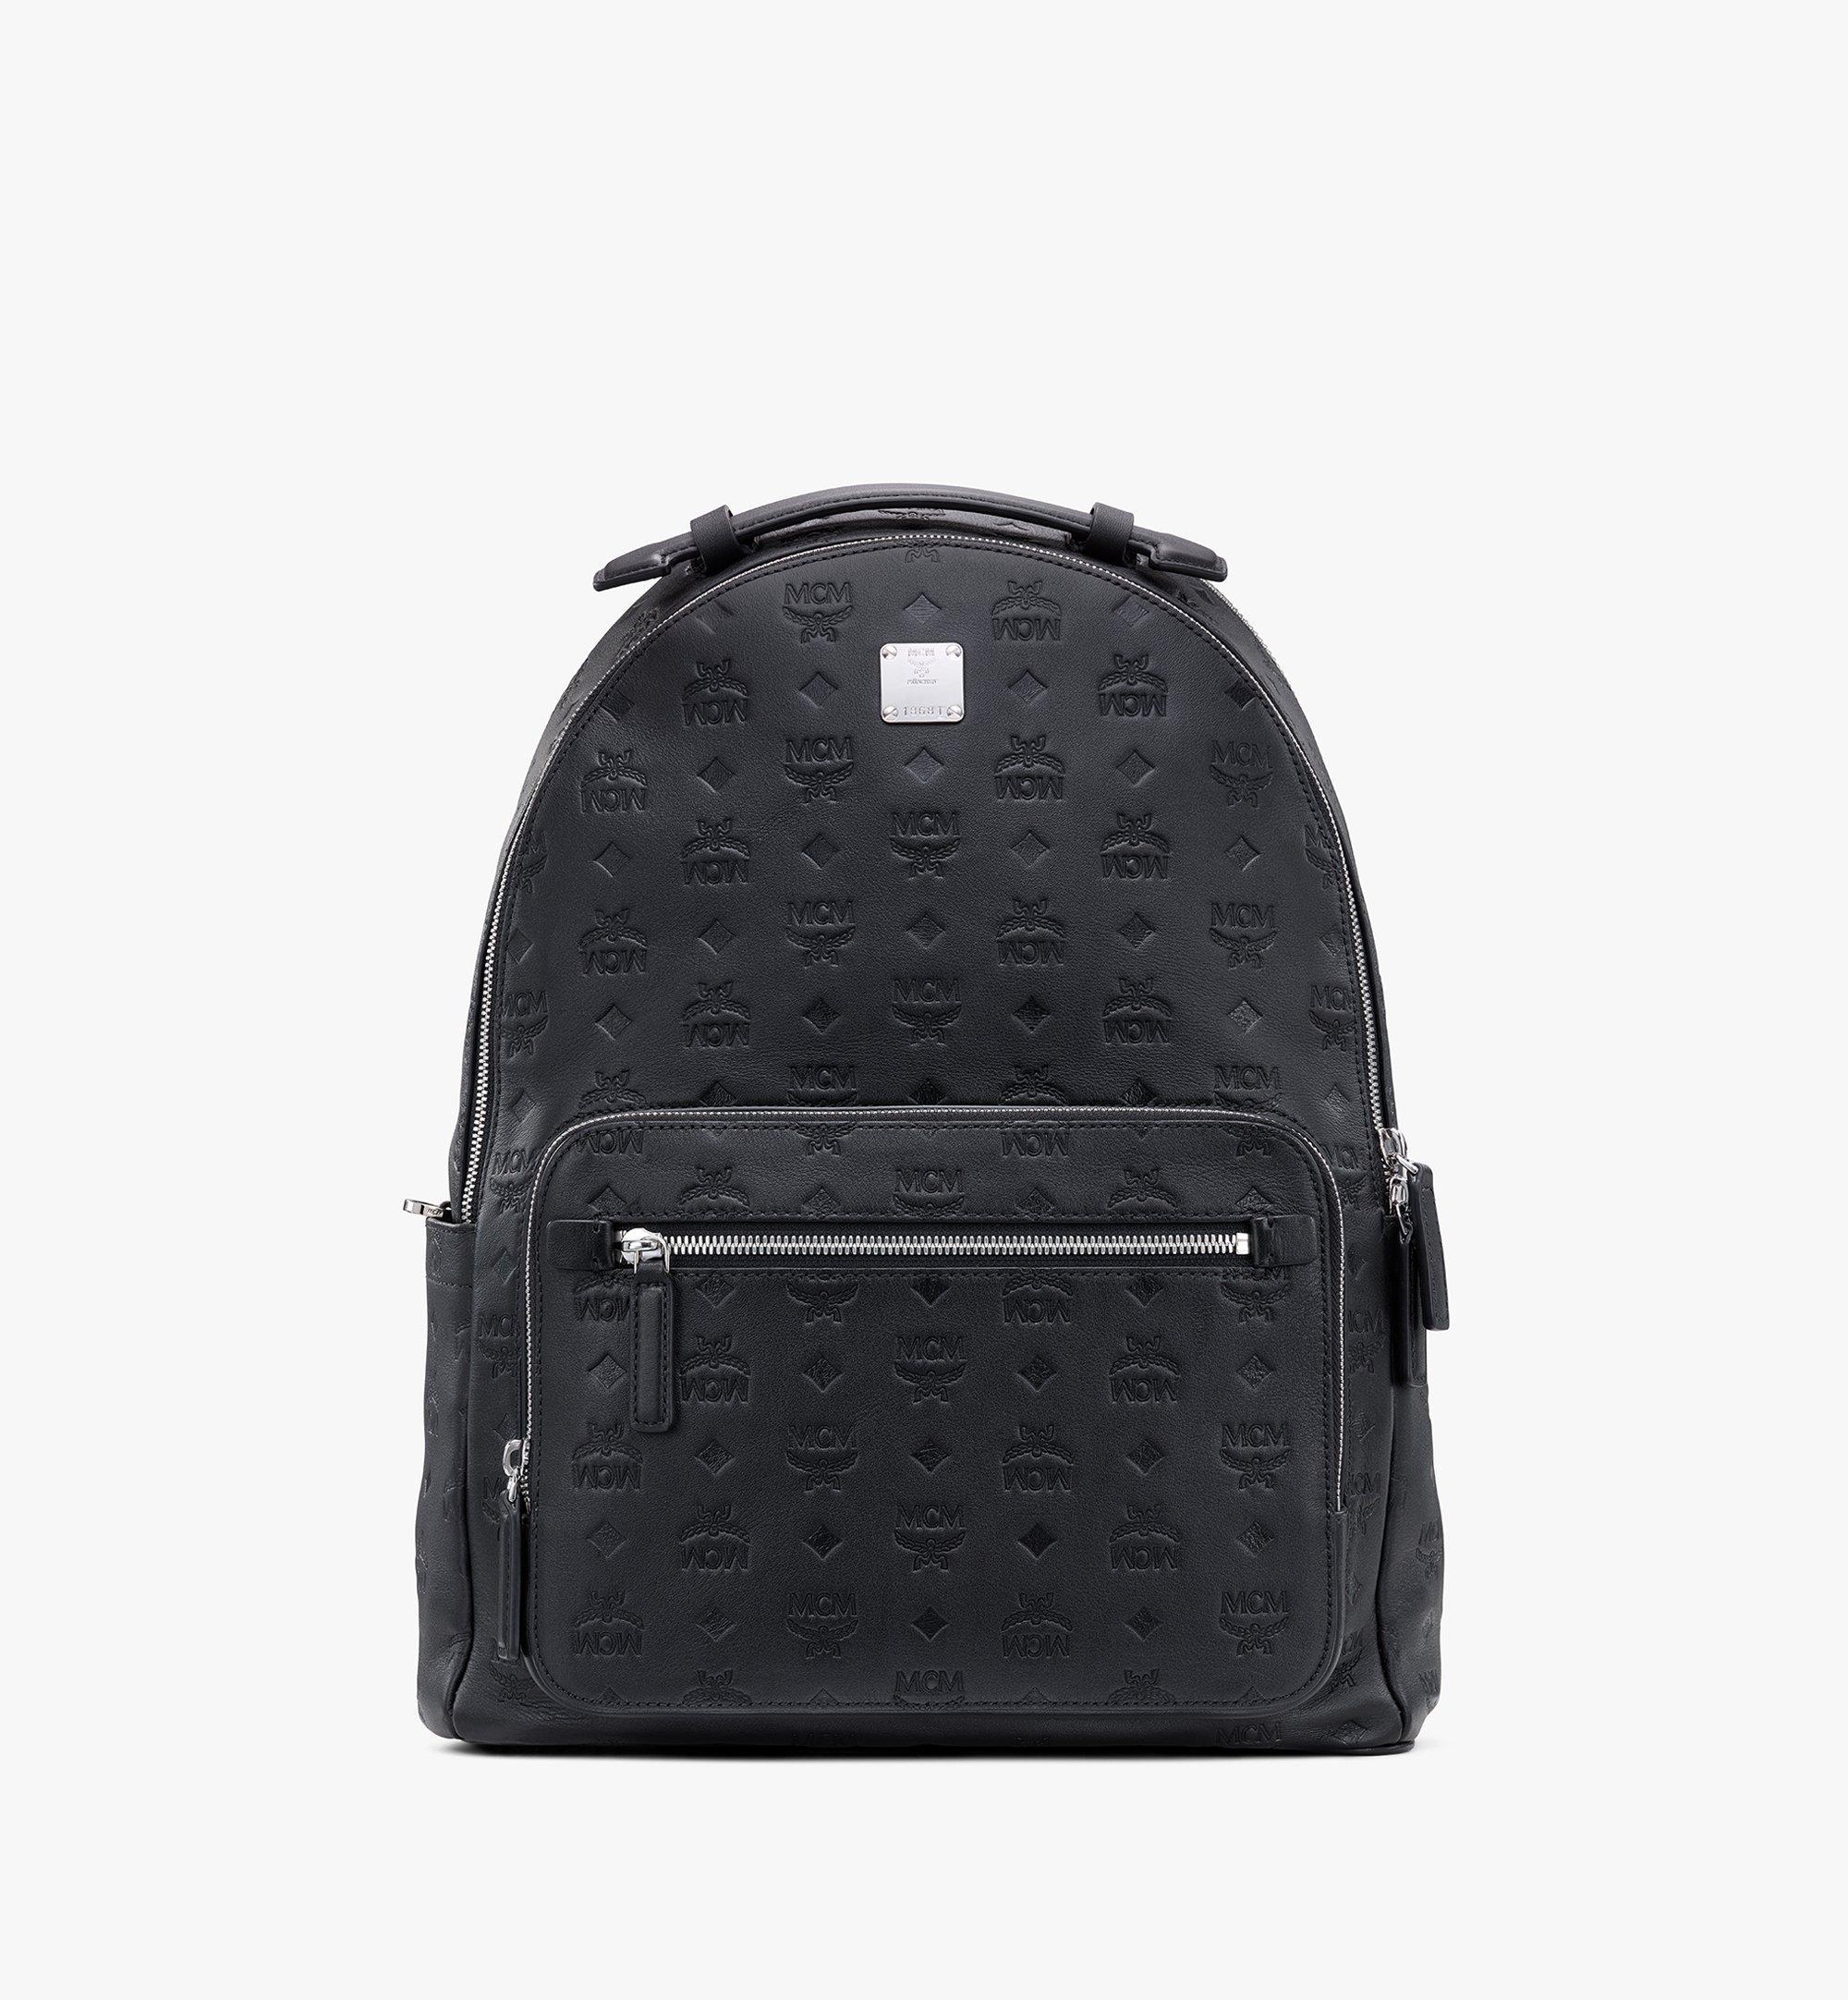 MCM Stark Backpack in Monogram Leather Black MMKASVE09BK001 Alternate View 1